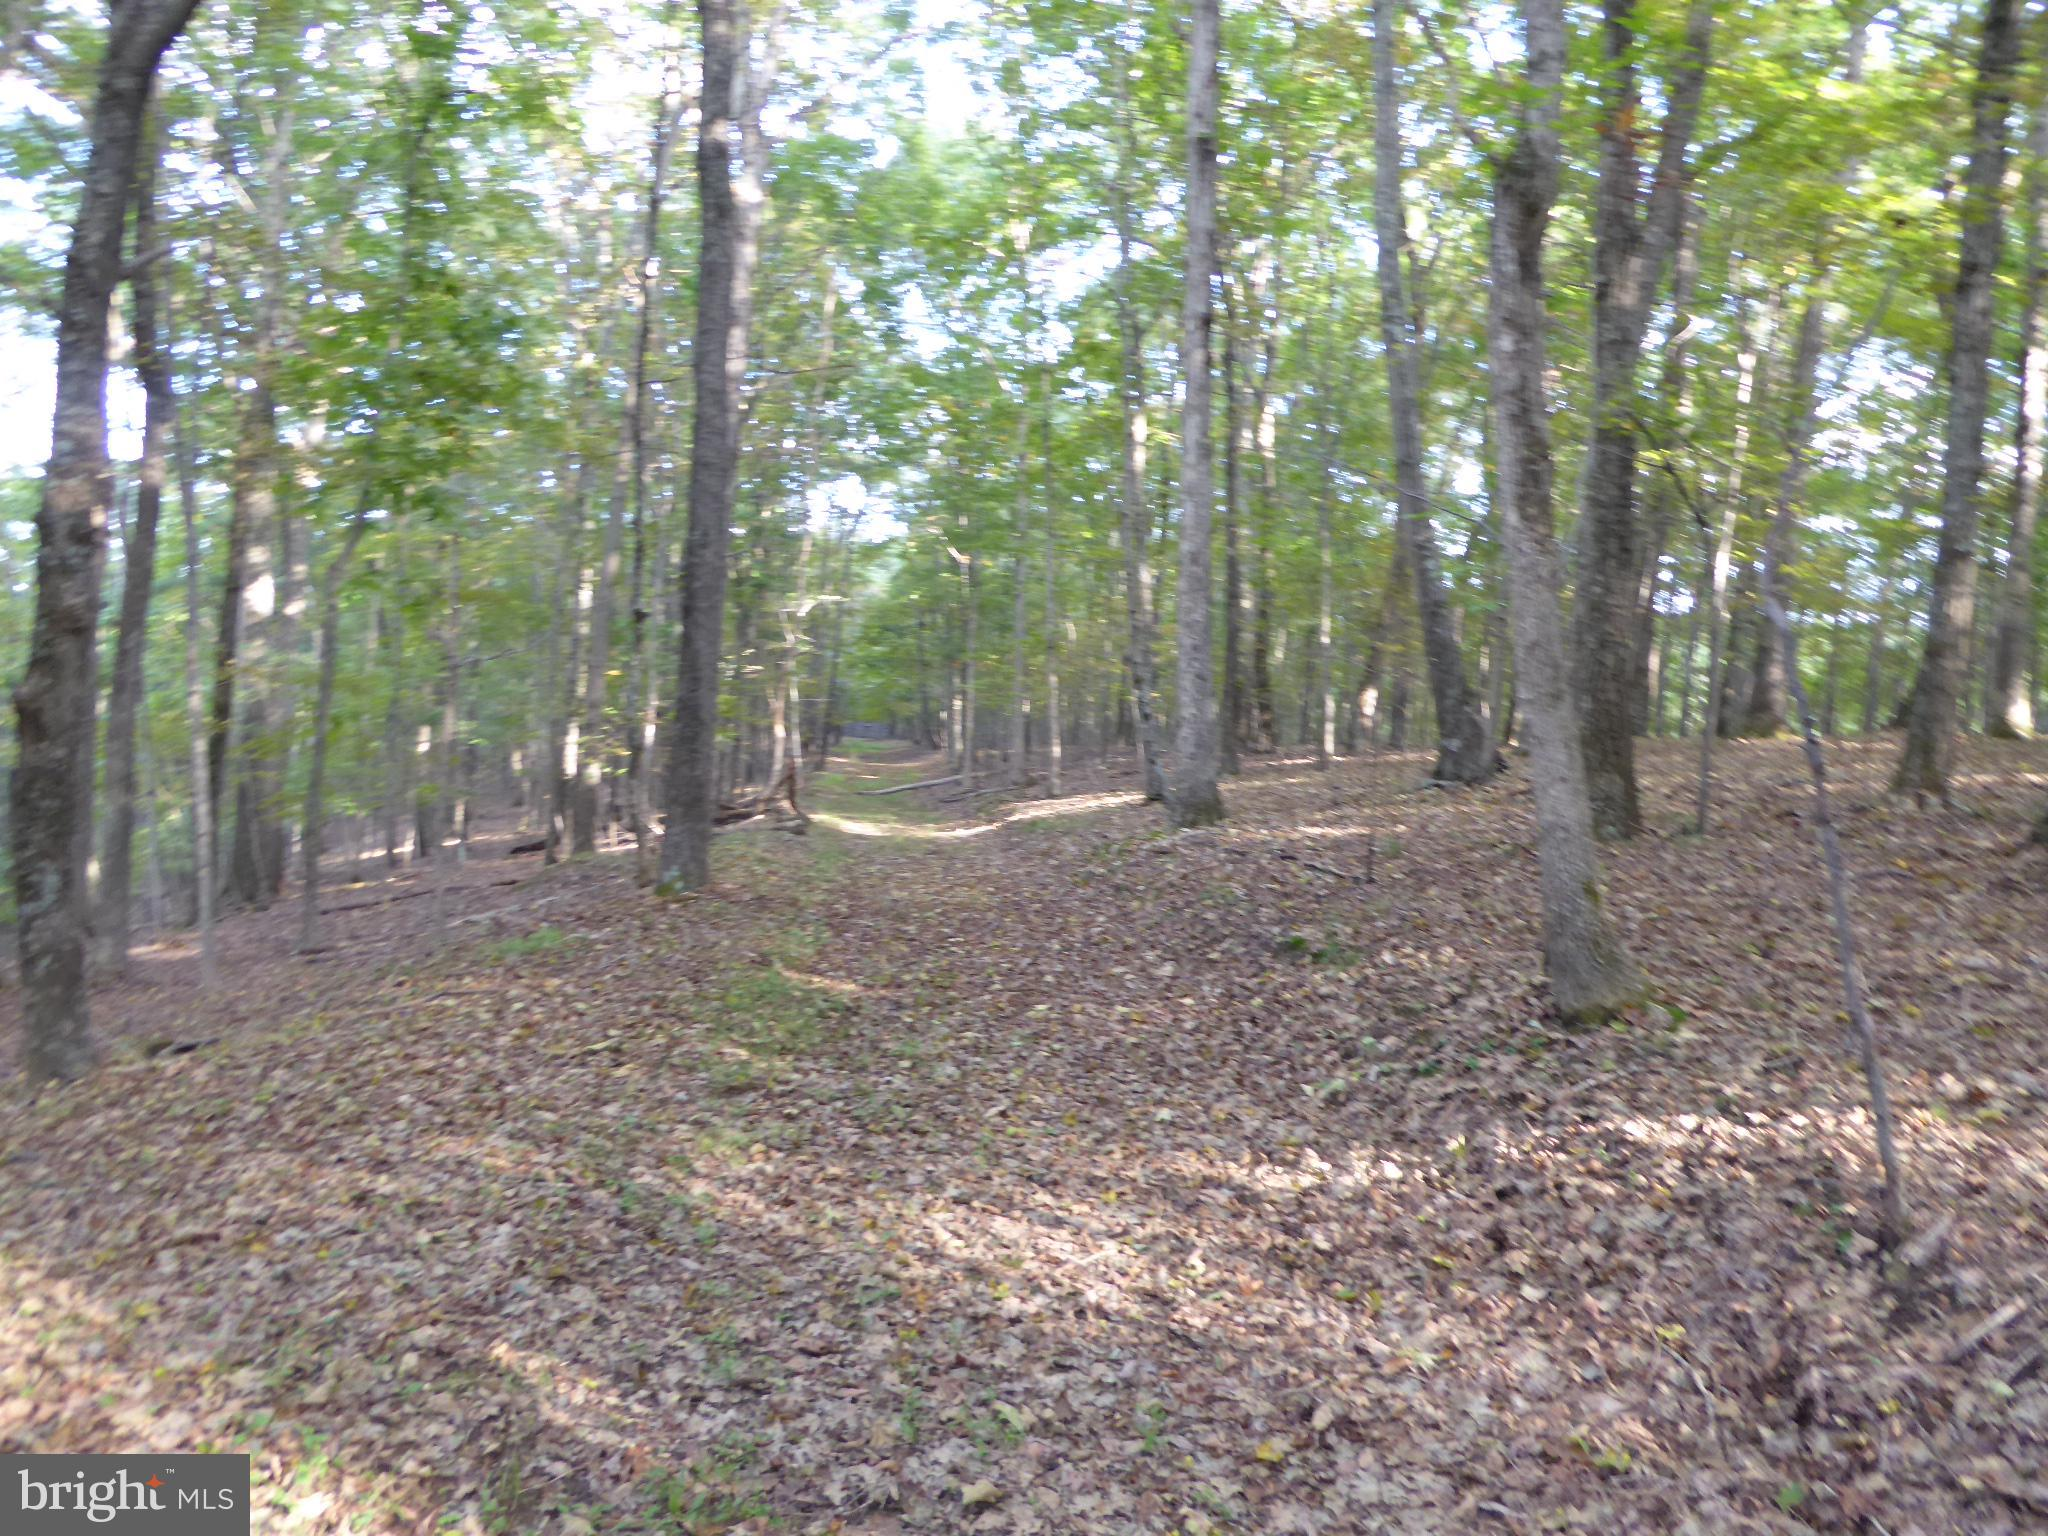 FOREST DRIVE, SHORT GAP, WV 26726